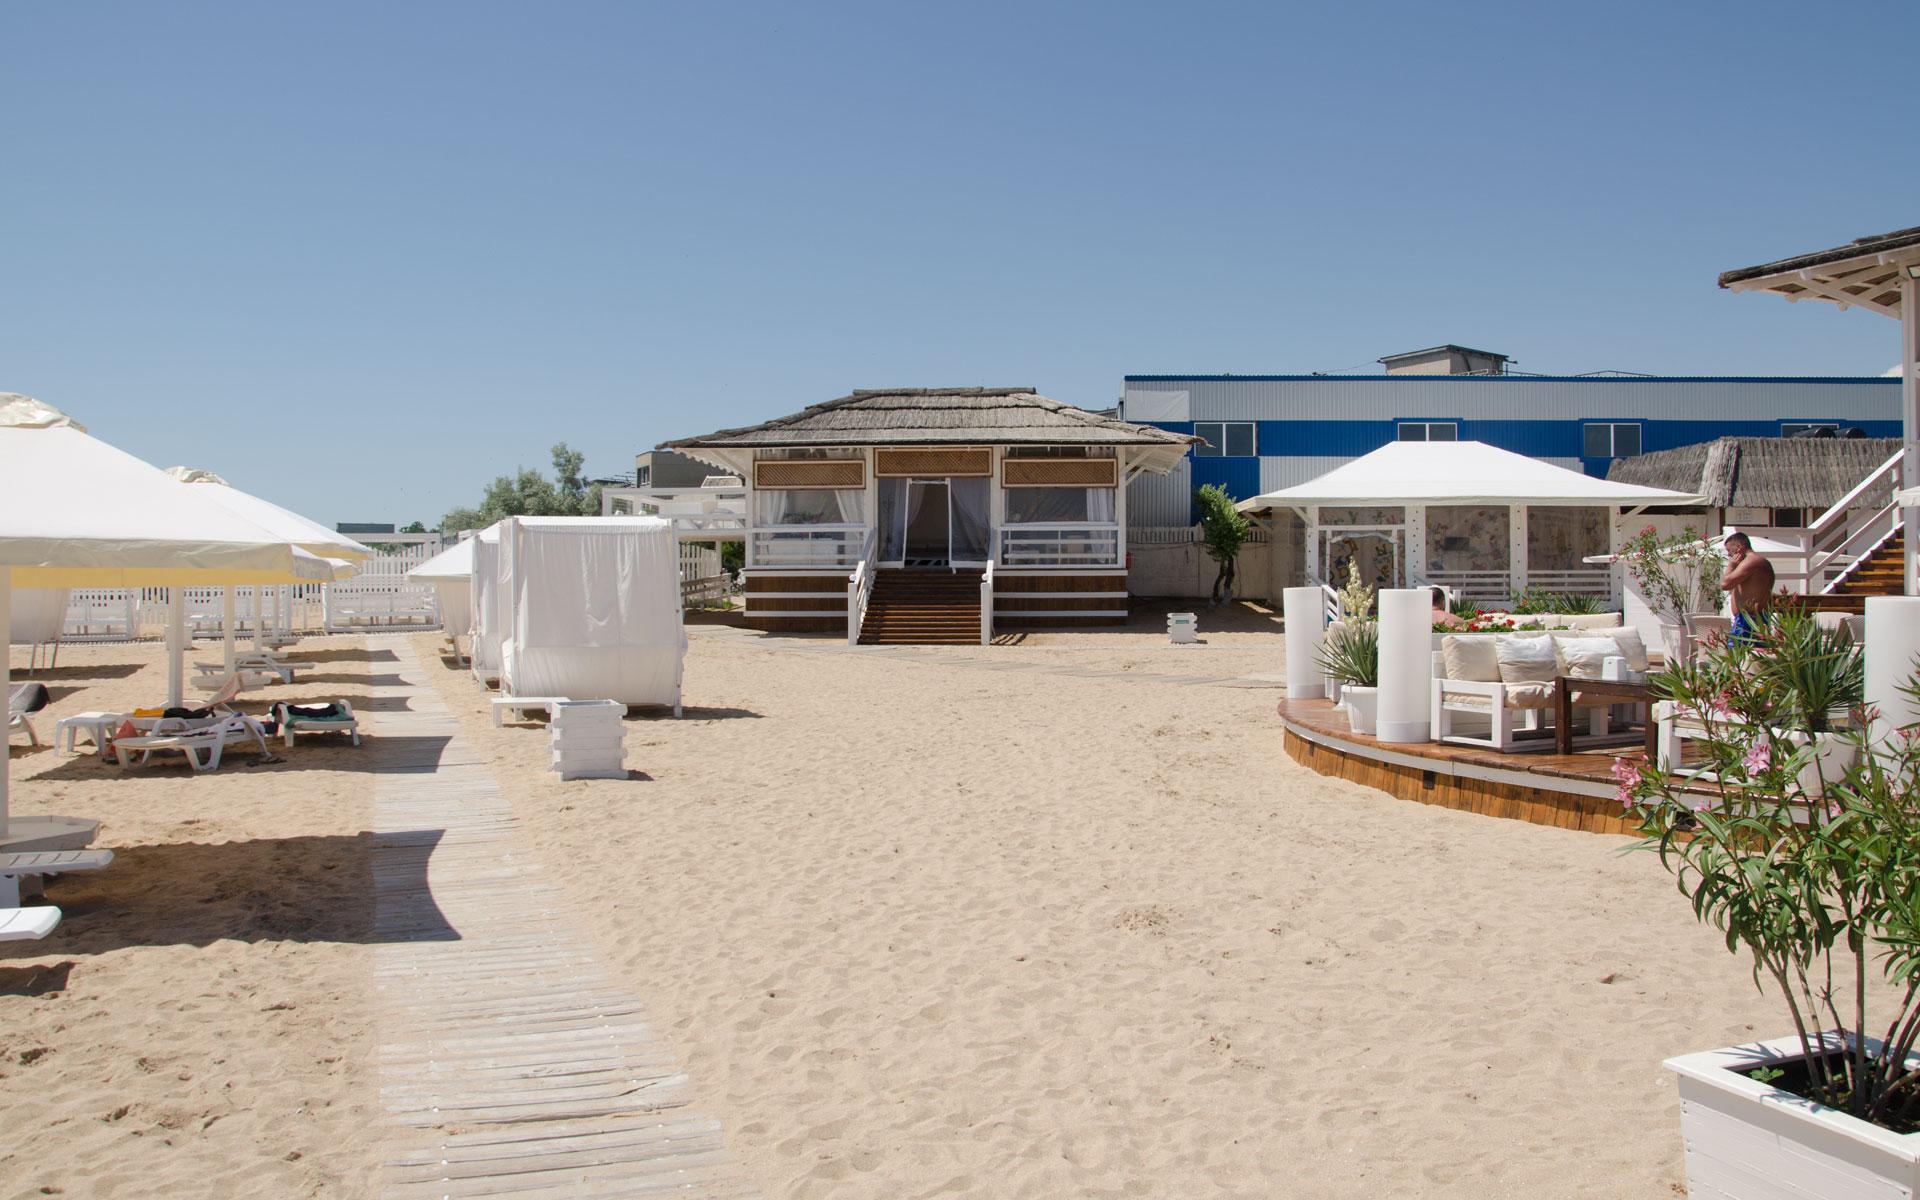 VIP беседка на пляже в Евпатории. Фото Евпатории